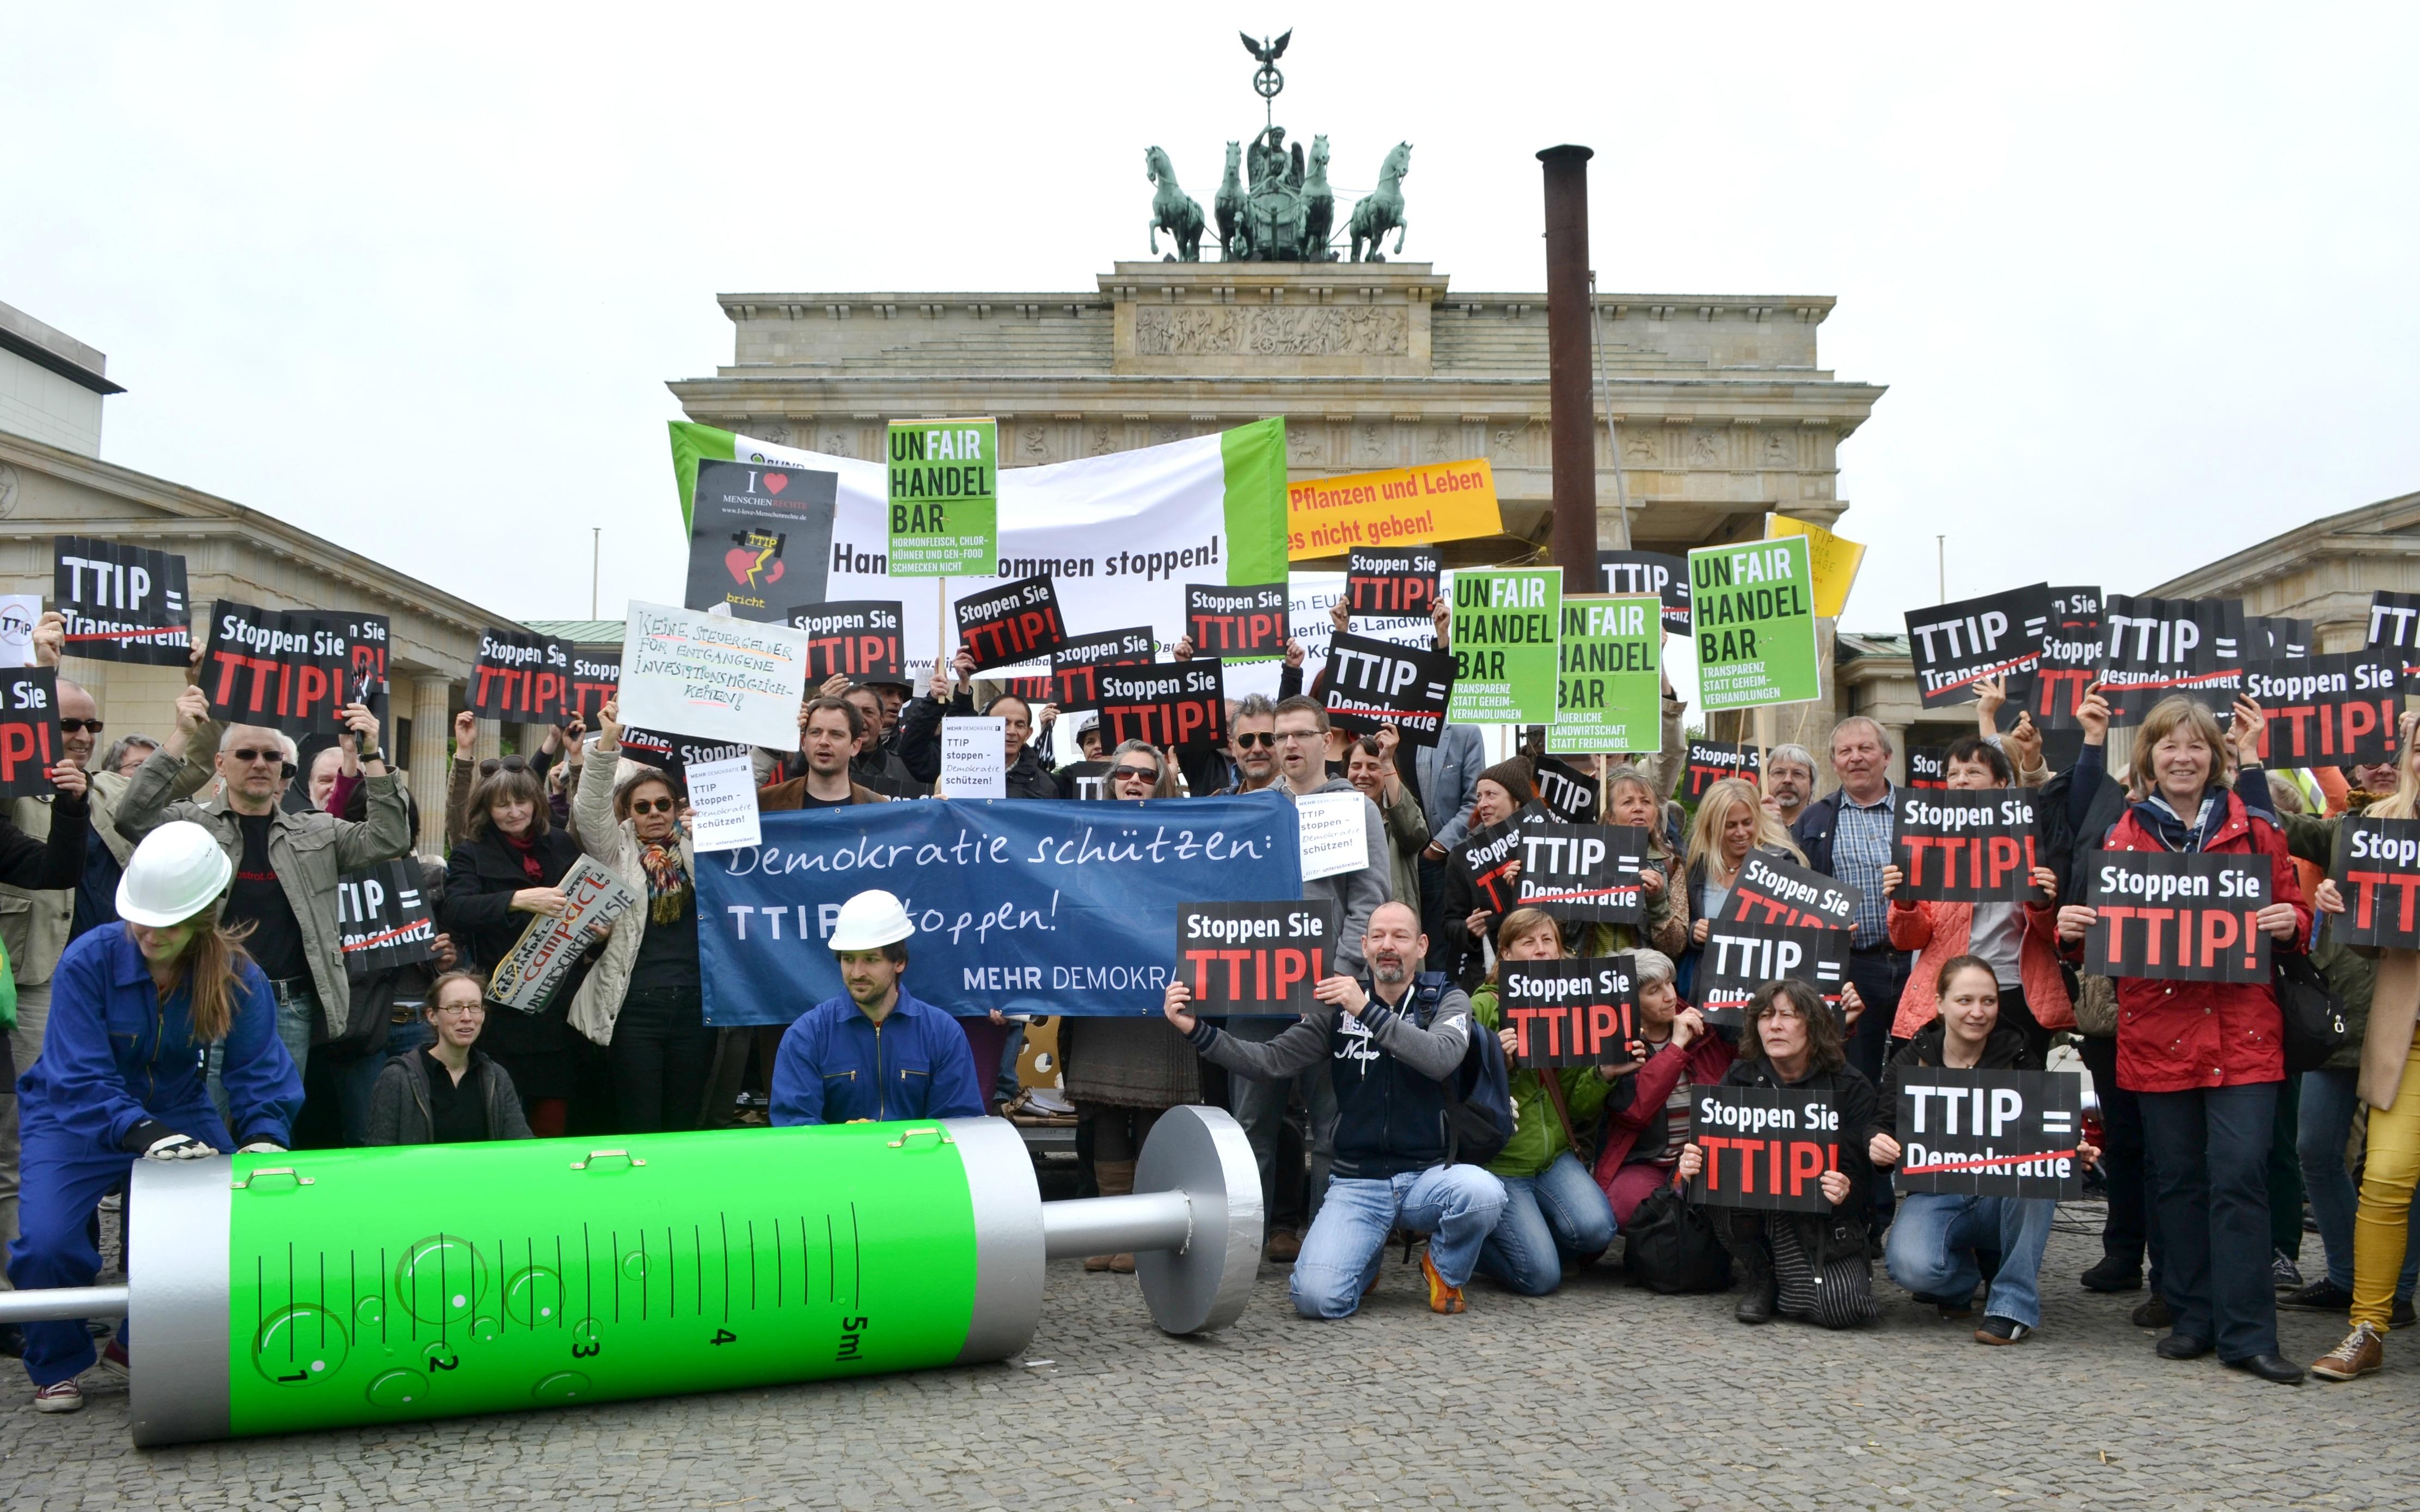 Dumping in the GATT/WTO